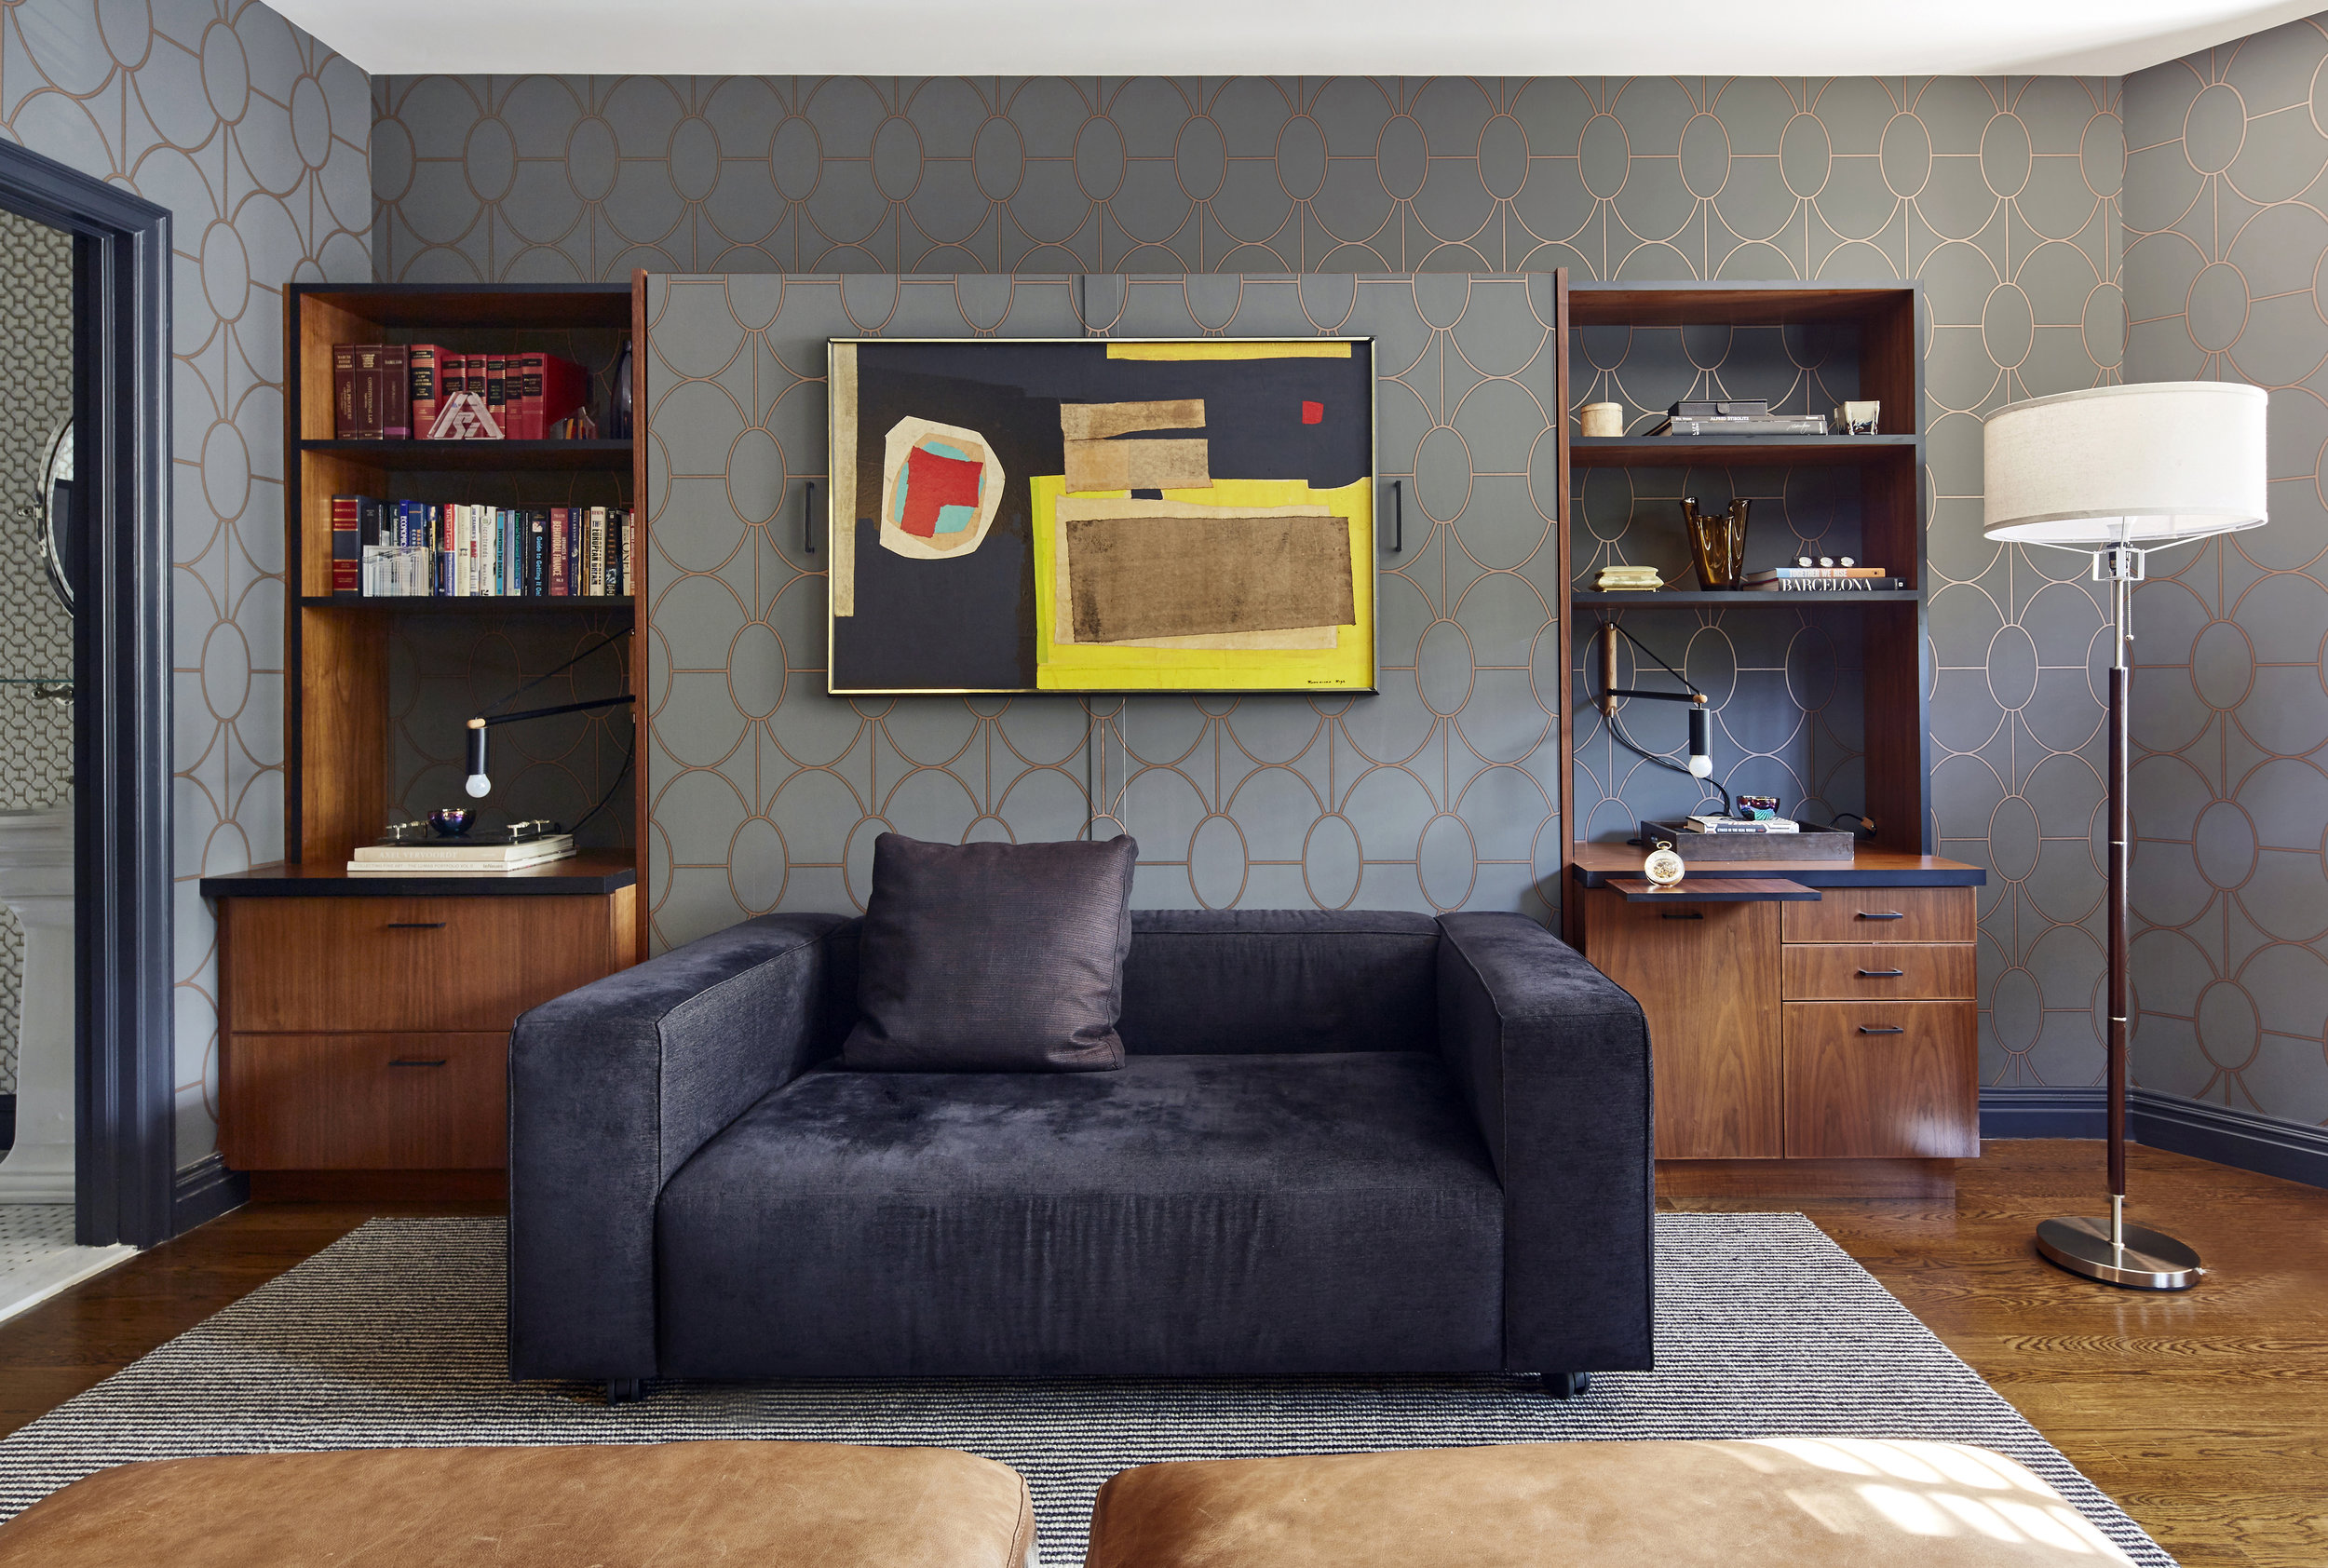 Murphy-Bed-Guest-Room-Office-Park-Slope-JMorris-Design.jpg